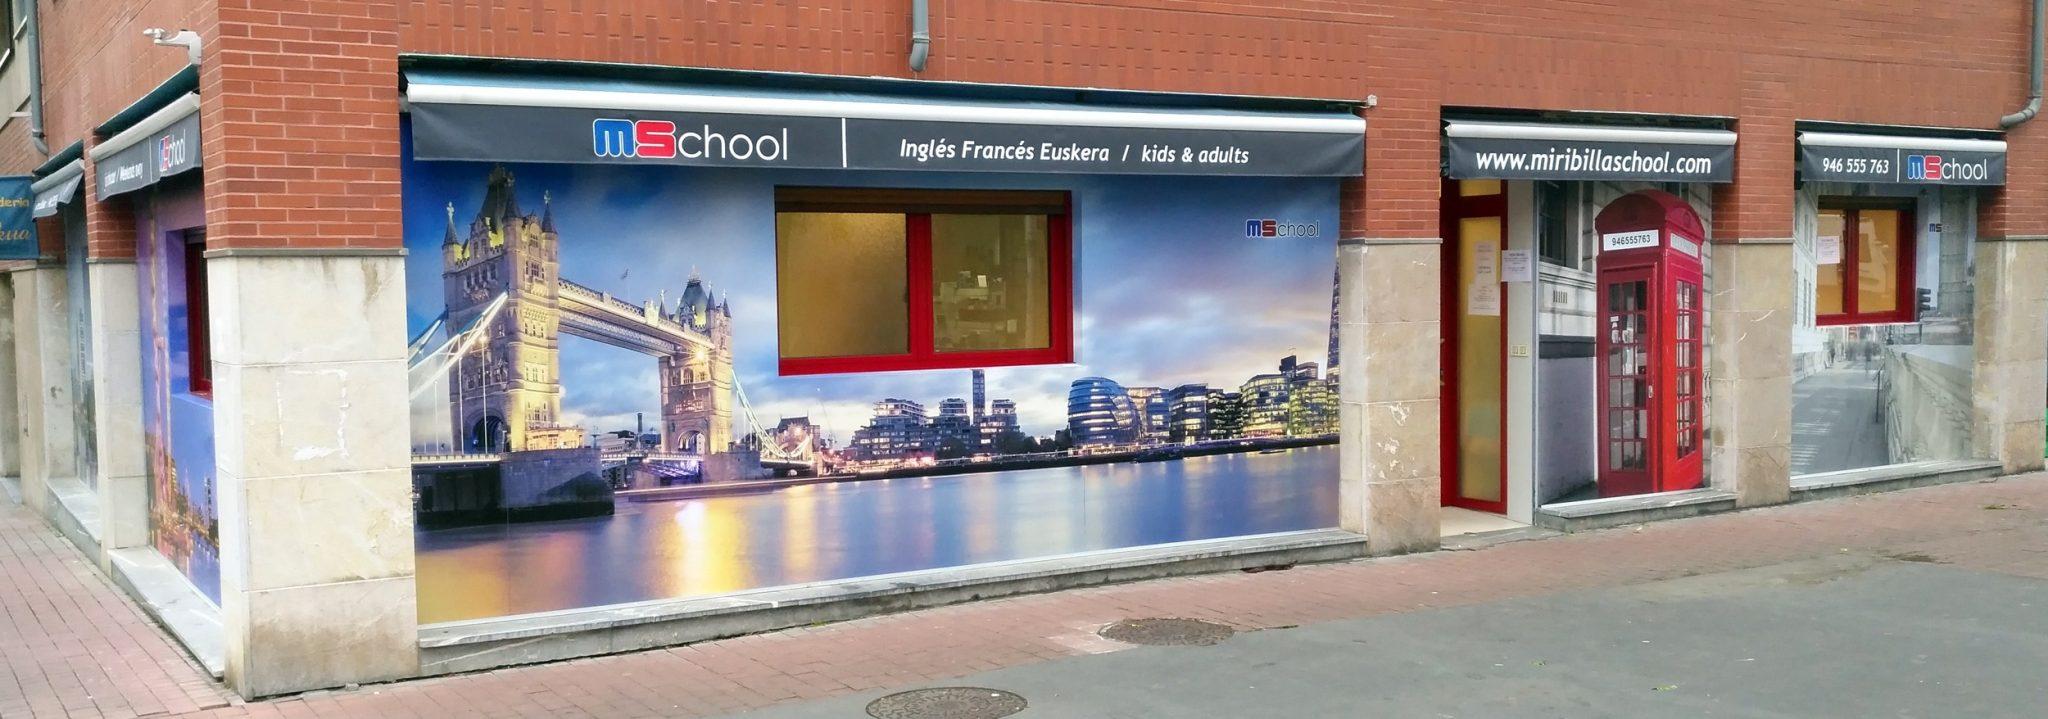 Miribilla School, Academia de inglés en Bilbao